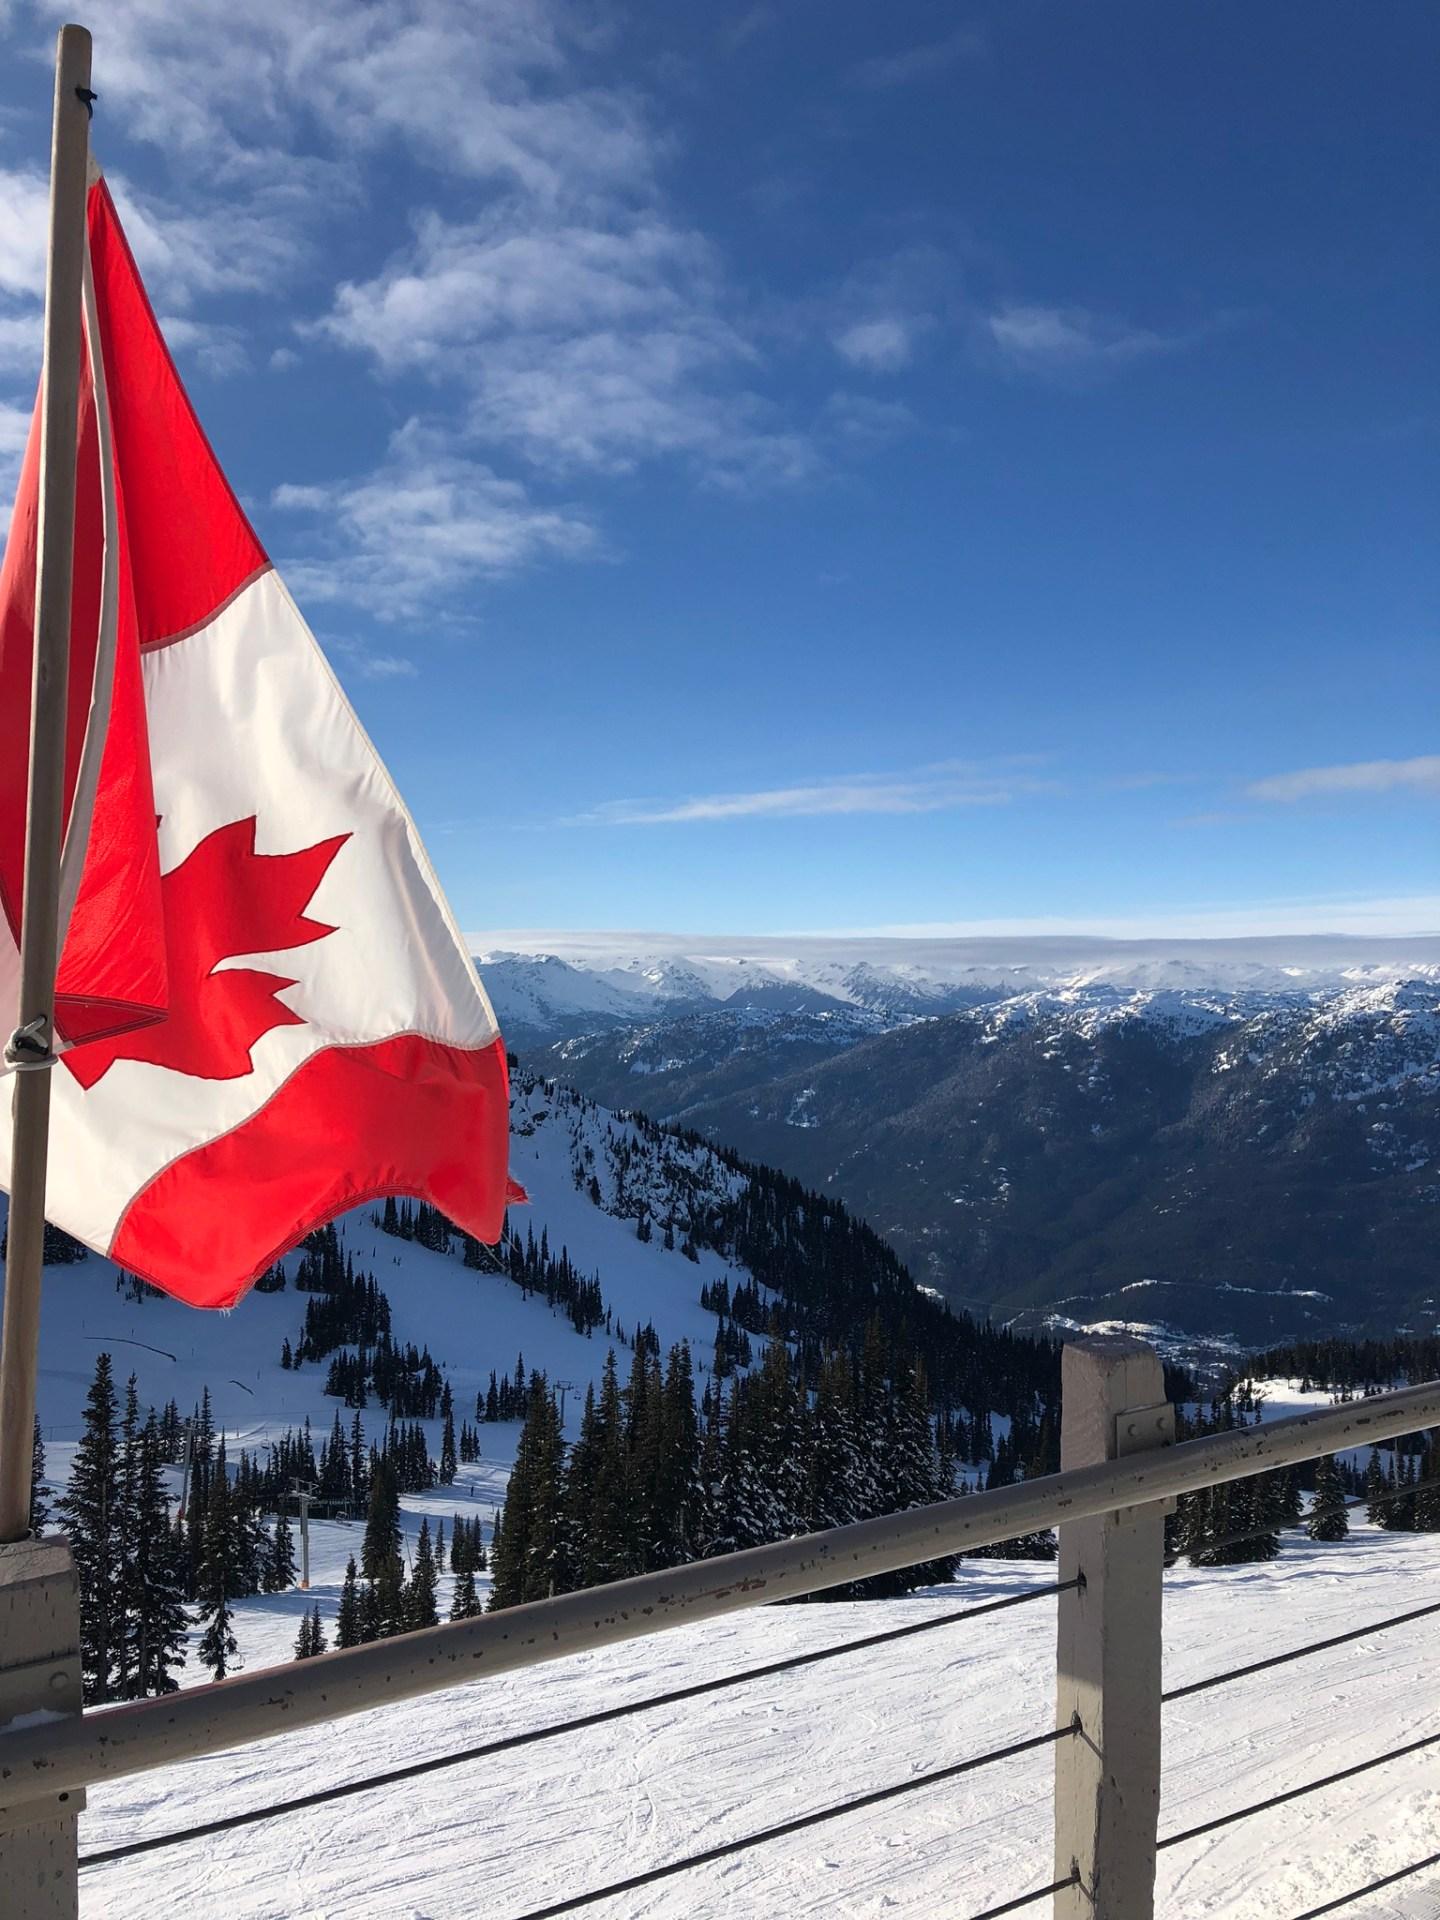 Canada flag at the peak of Whistler mountain